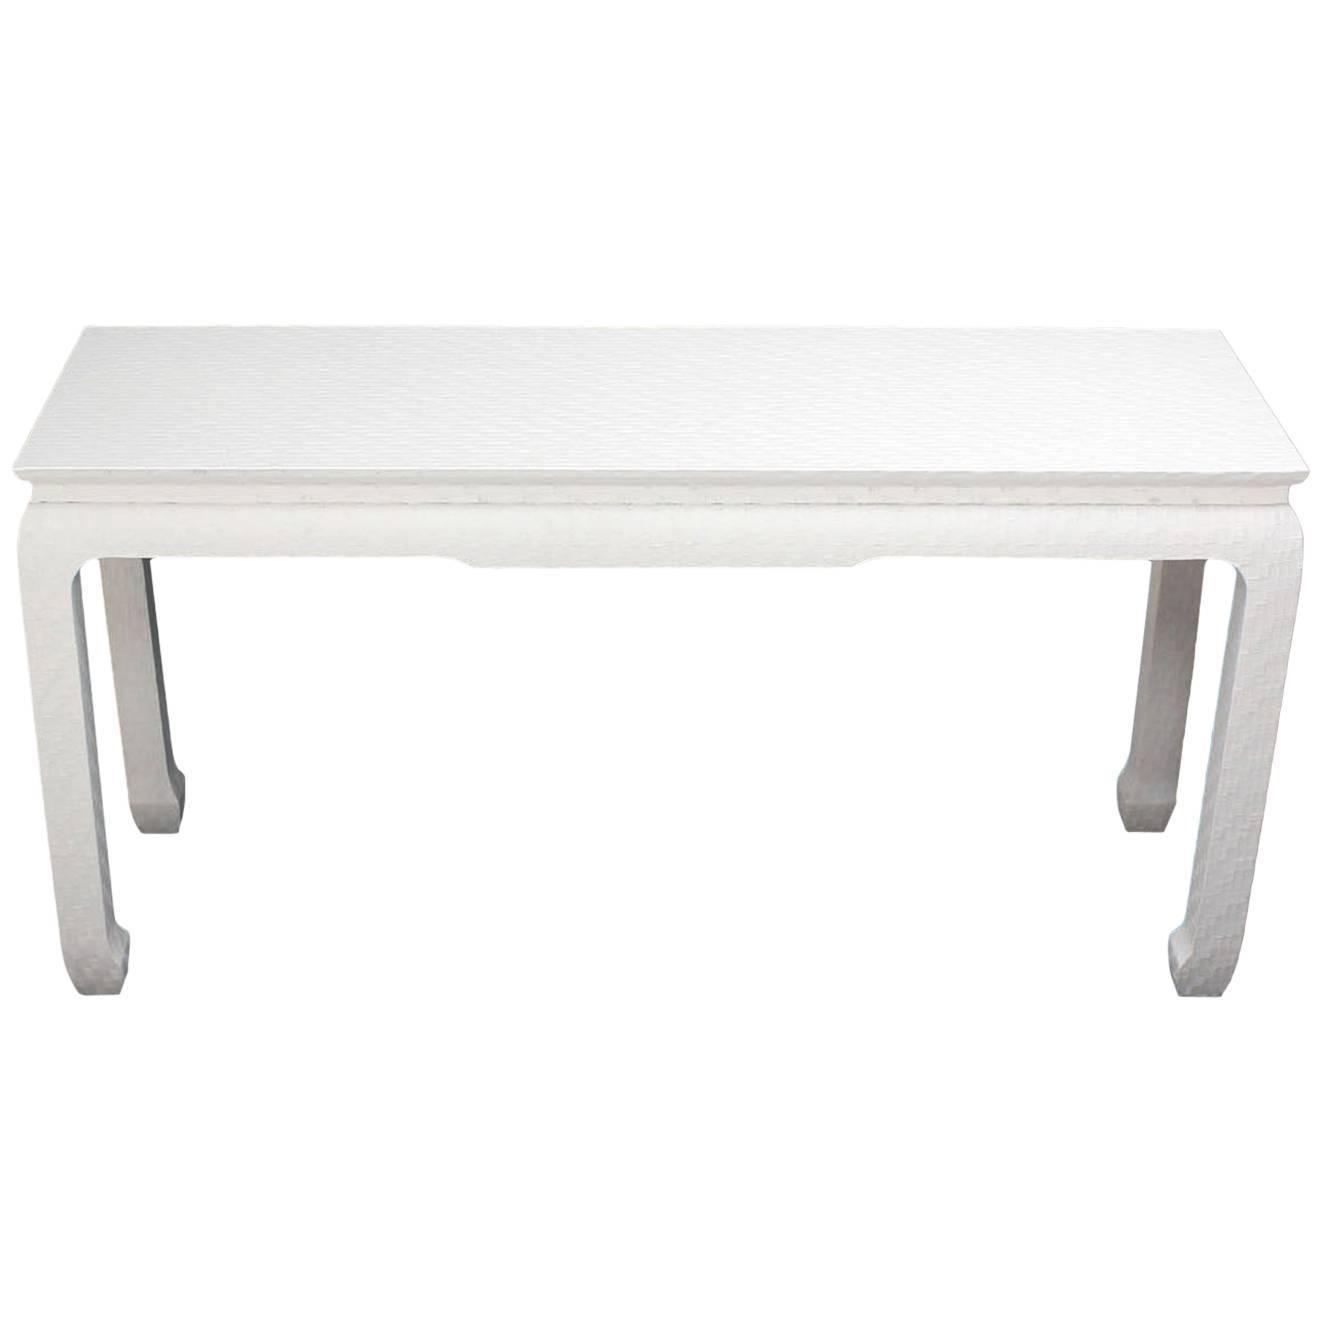 Cloth covered white lacquer console sofa table by baker grass cloth covered white lacquer console sofa table by baker geotapseo Gallery